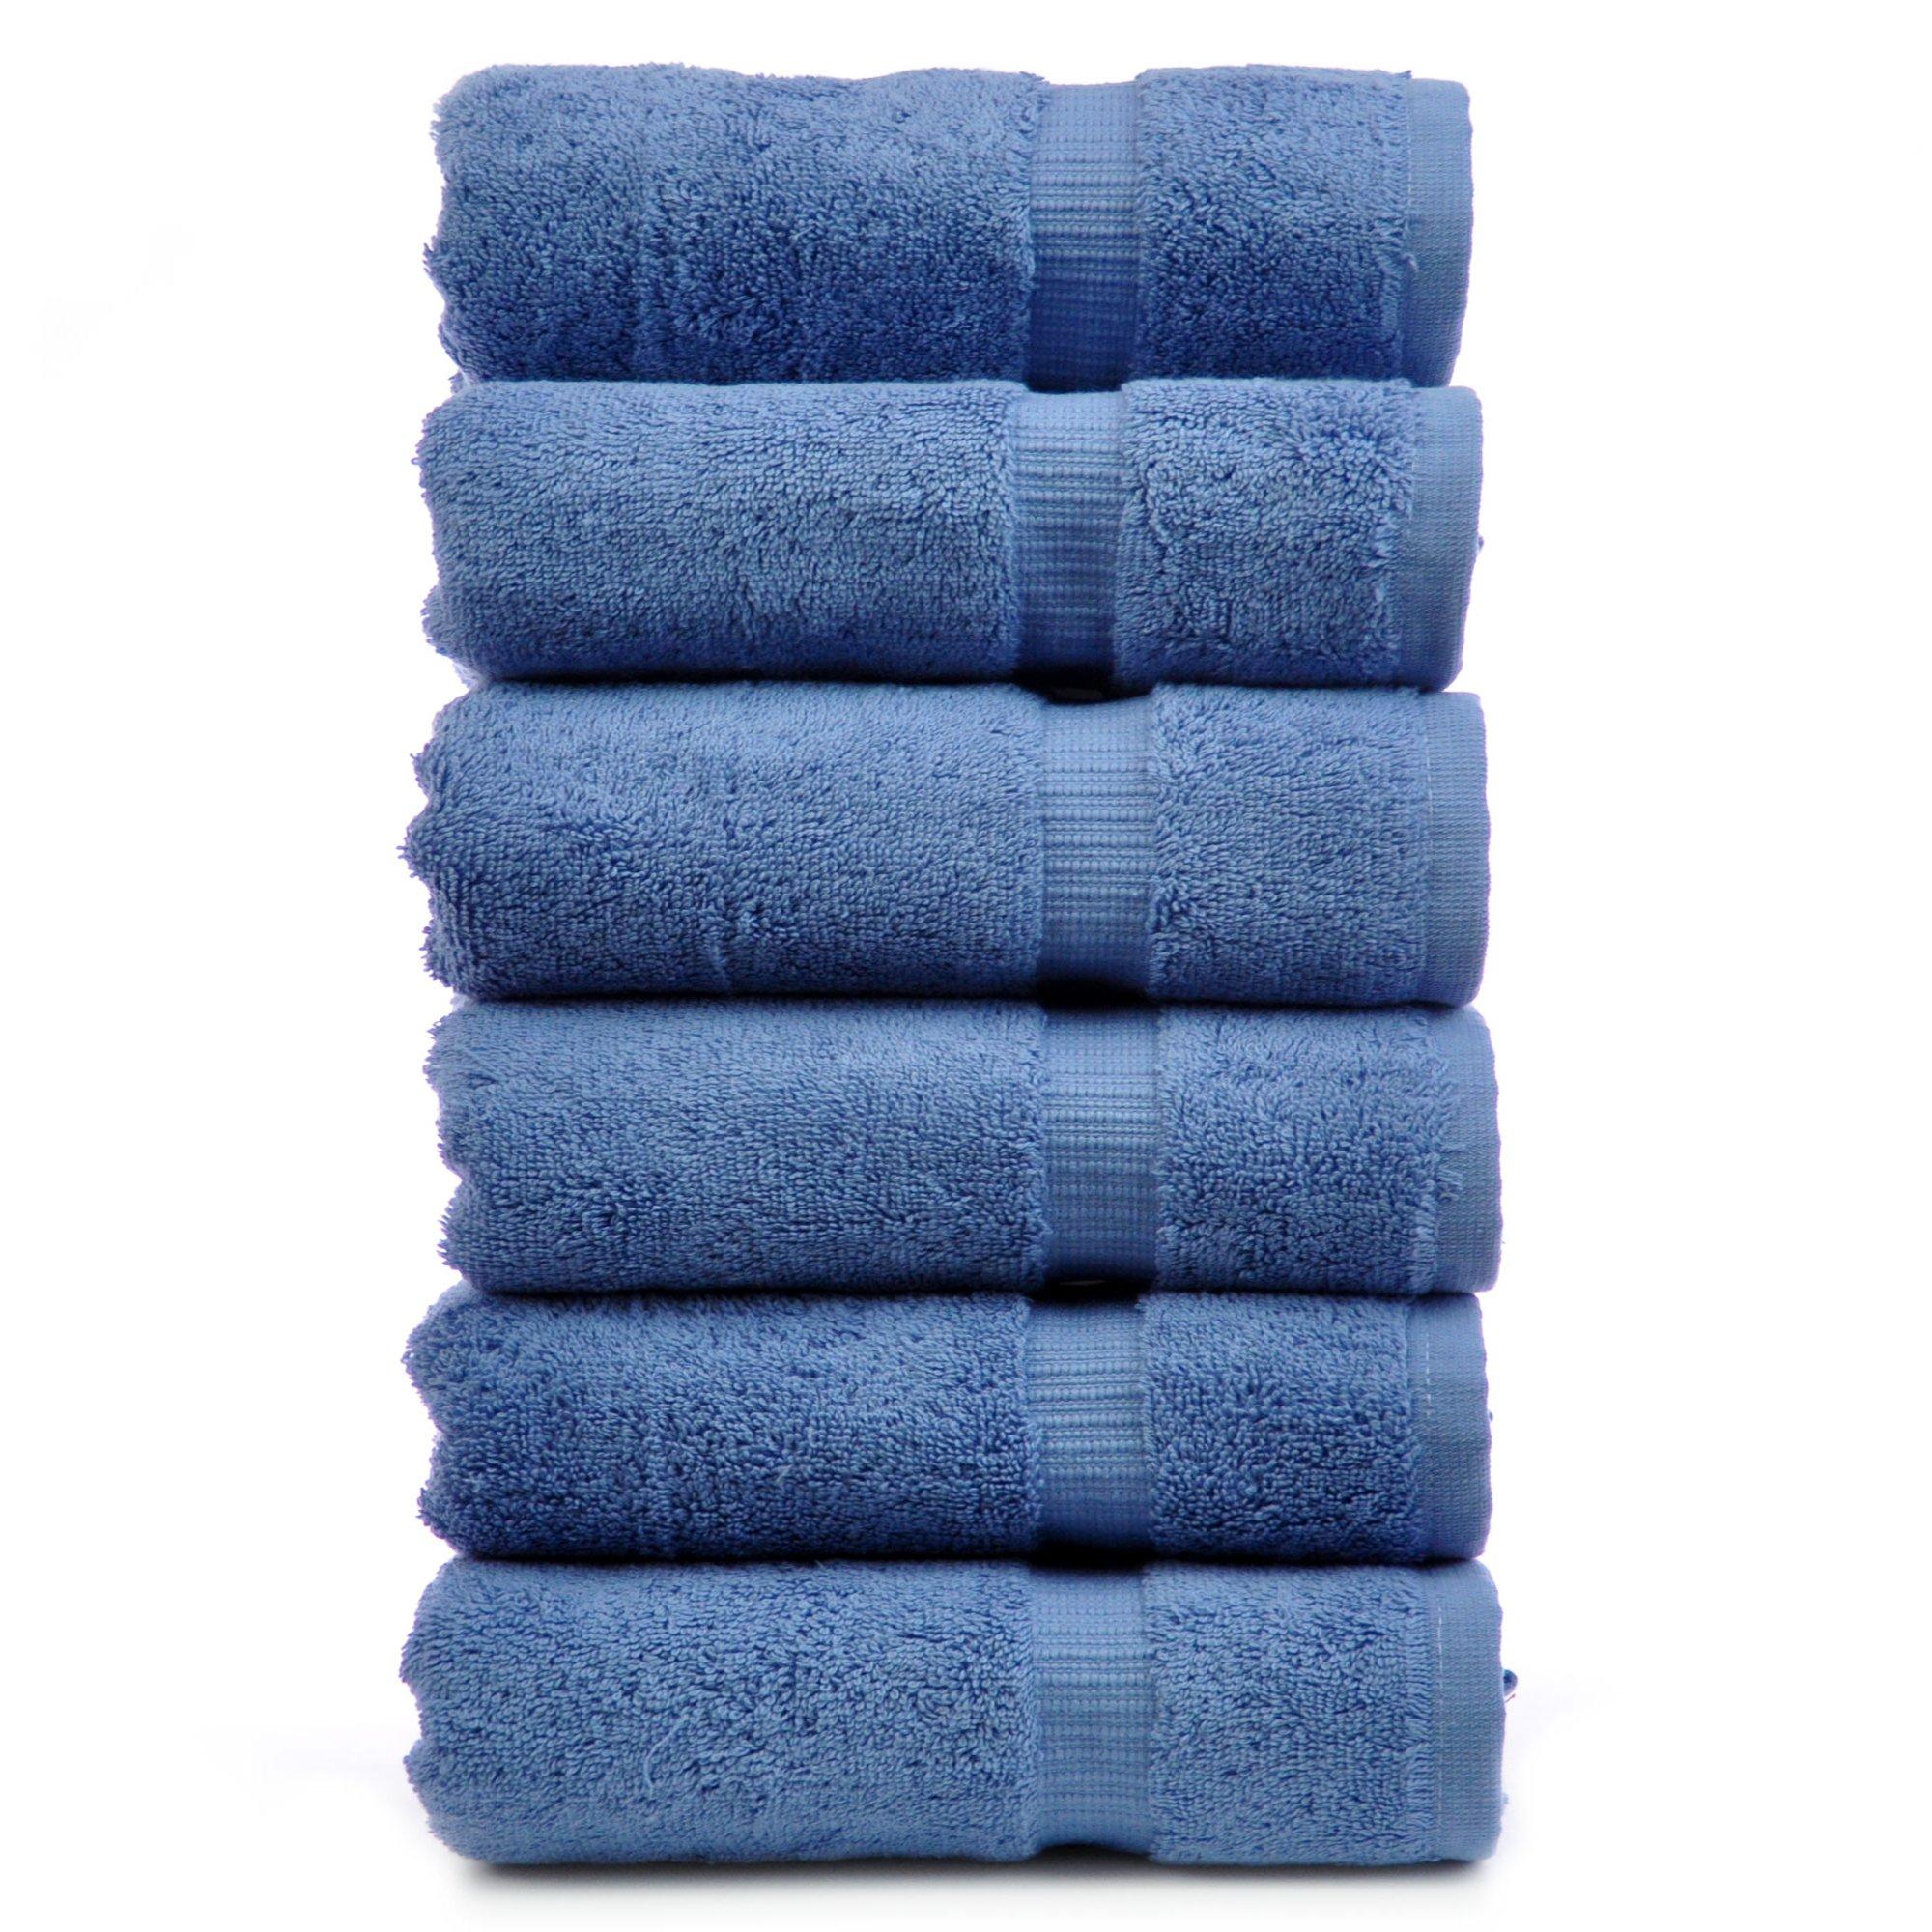 Chakir Turkish Linens Turkish Cotton Luxury Hotel & Spa Bath Towel, Hand Towel - Set of 6, Wedgewood